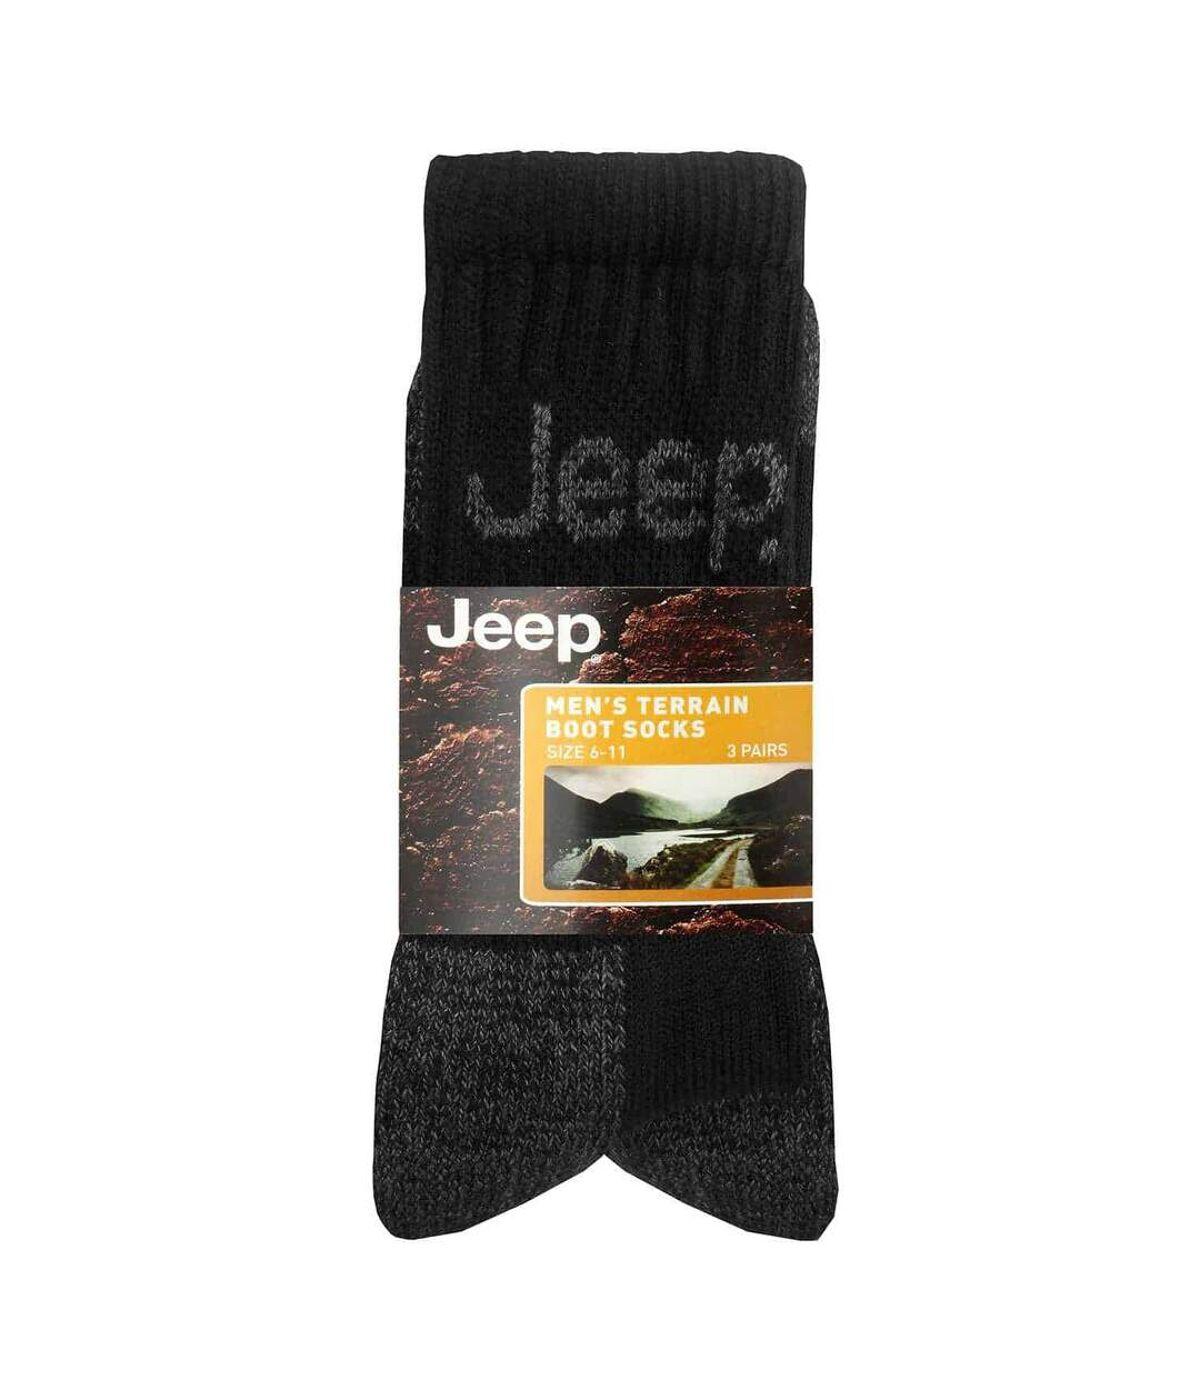 Mens 3 Pk Jeep Terrain Cushion Sole Hiking Socks